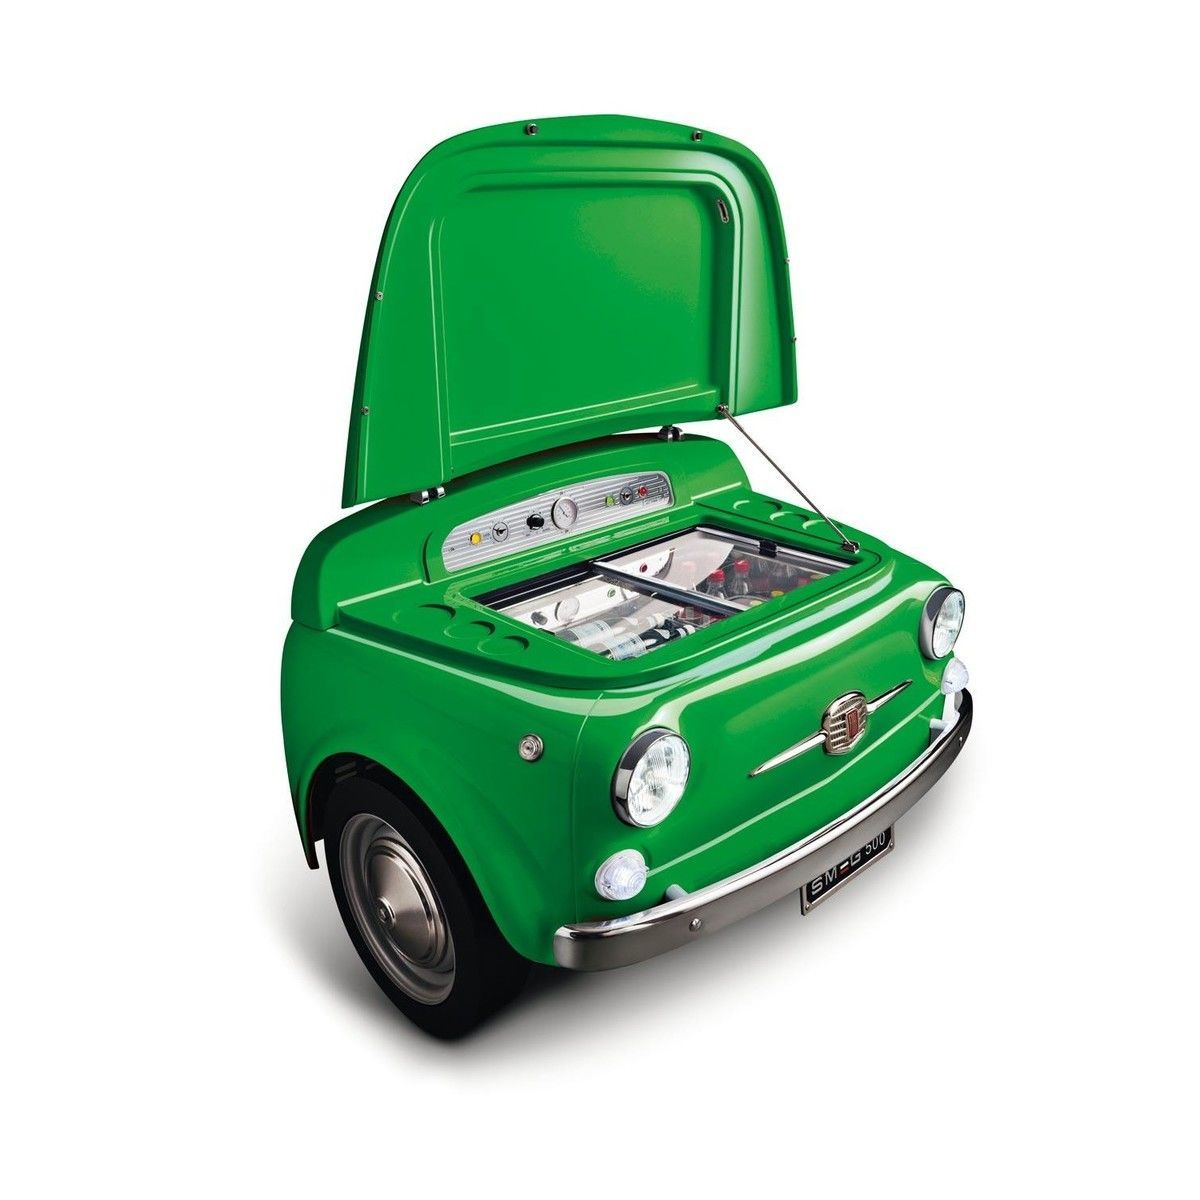 Smeg fiat 500 minibar smeg smeg consumer products - Smeg productos ...